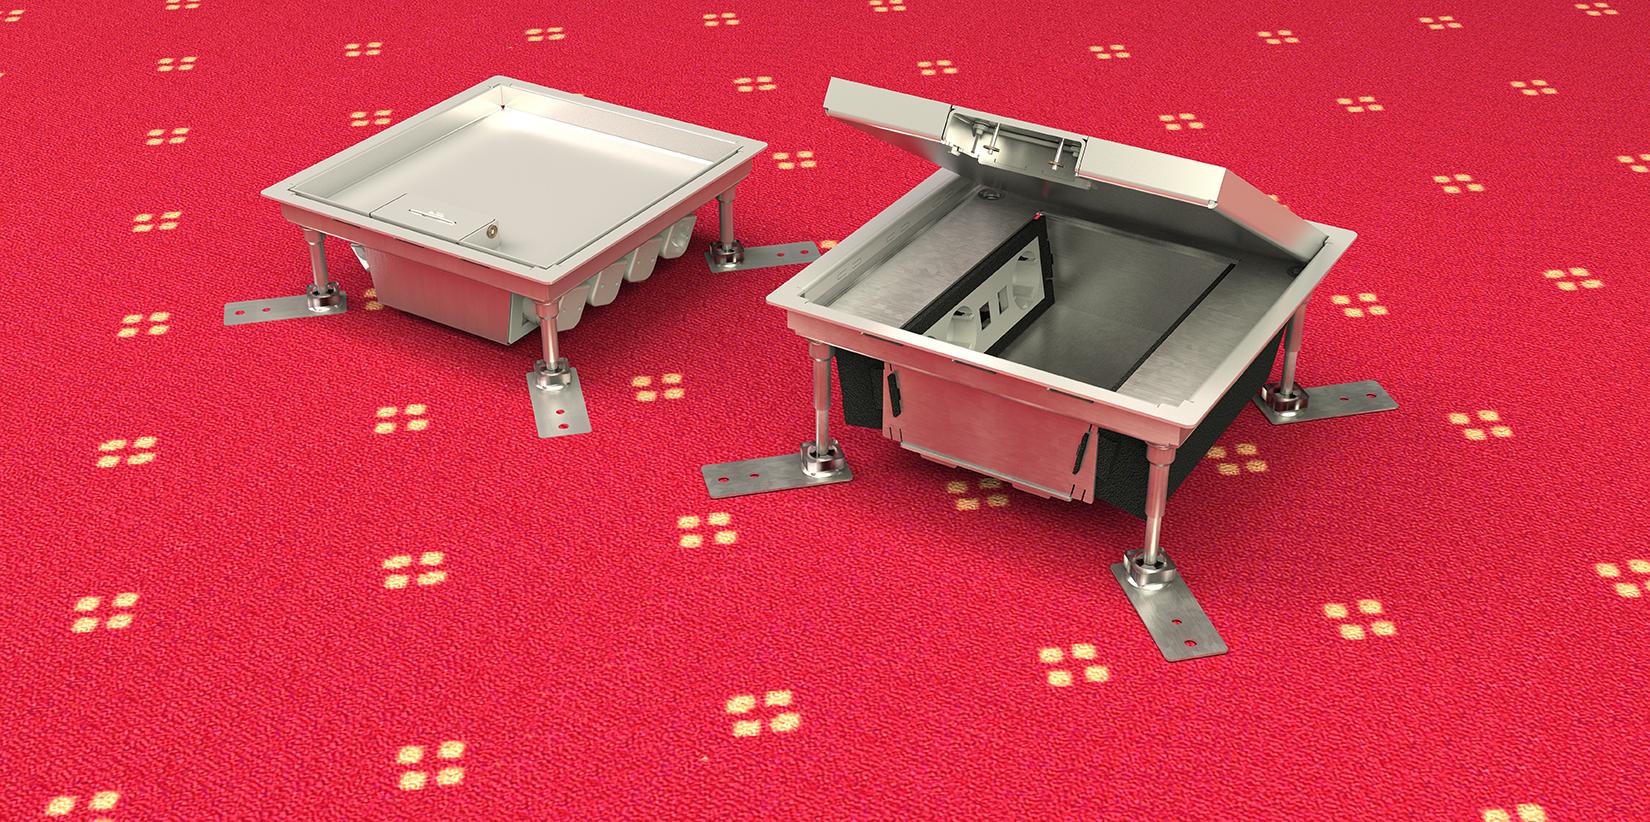 ECO-sorozatú padlódobozok